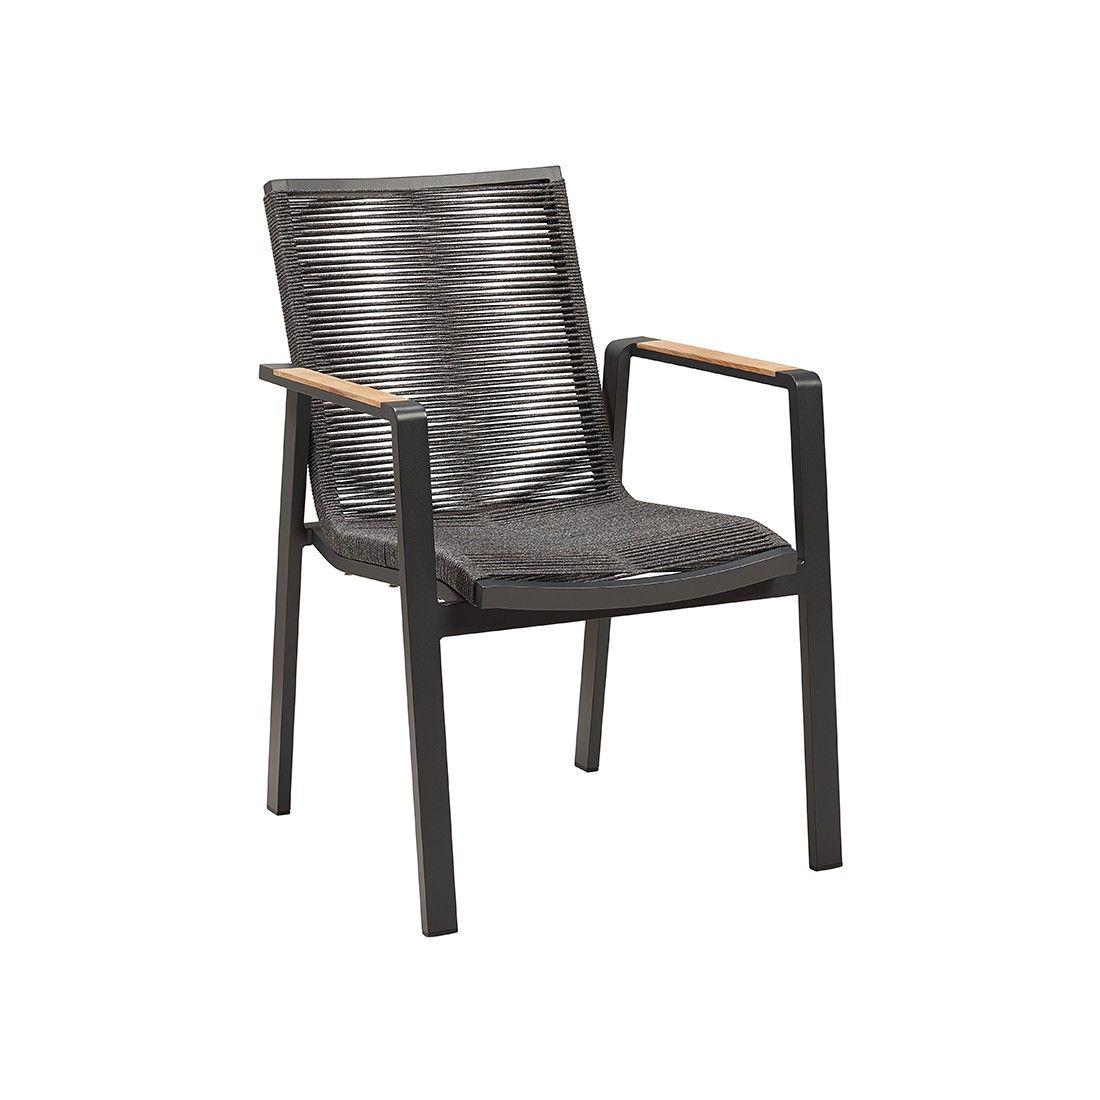 Large fauteuil de table de jardin en alu et tissu Olefin avec accoudoirs en teck, empilable, Moreno